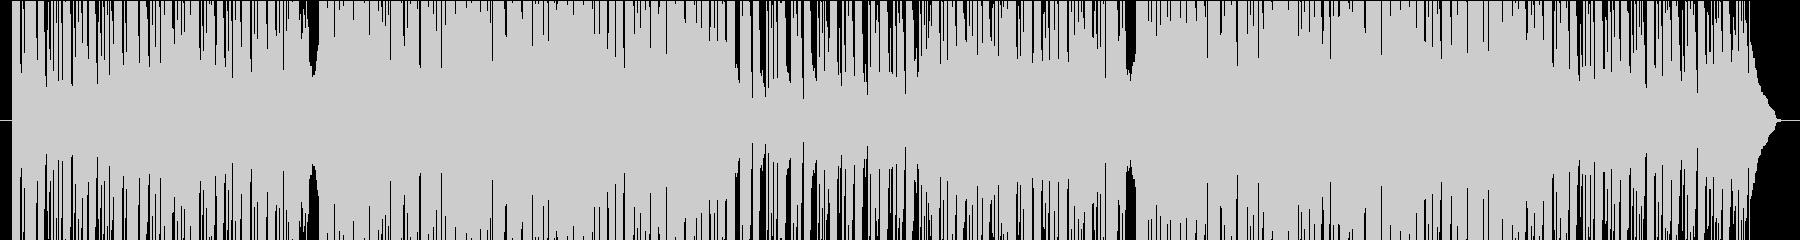 Happy moving pop's unreproduced waveform